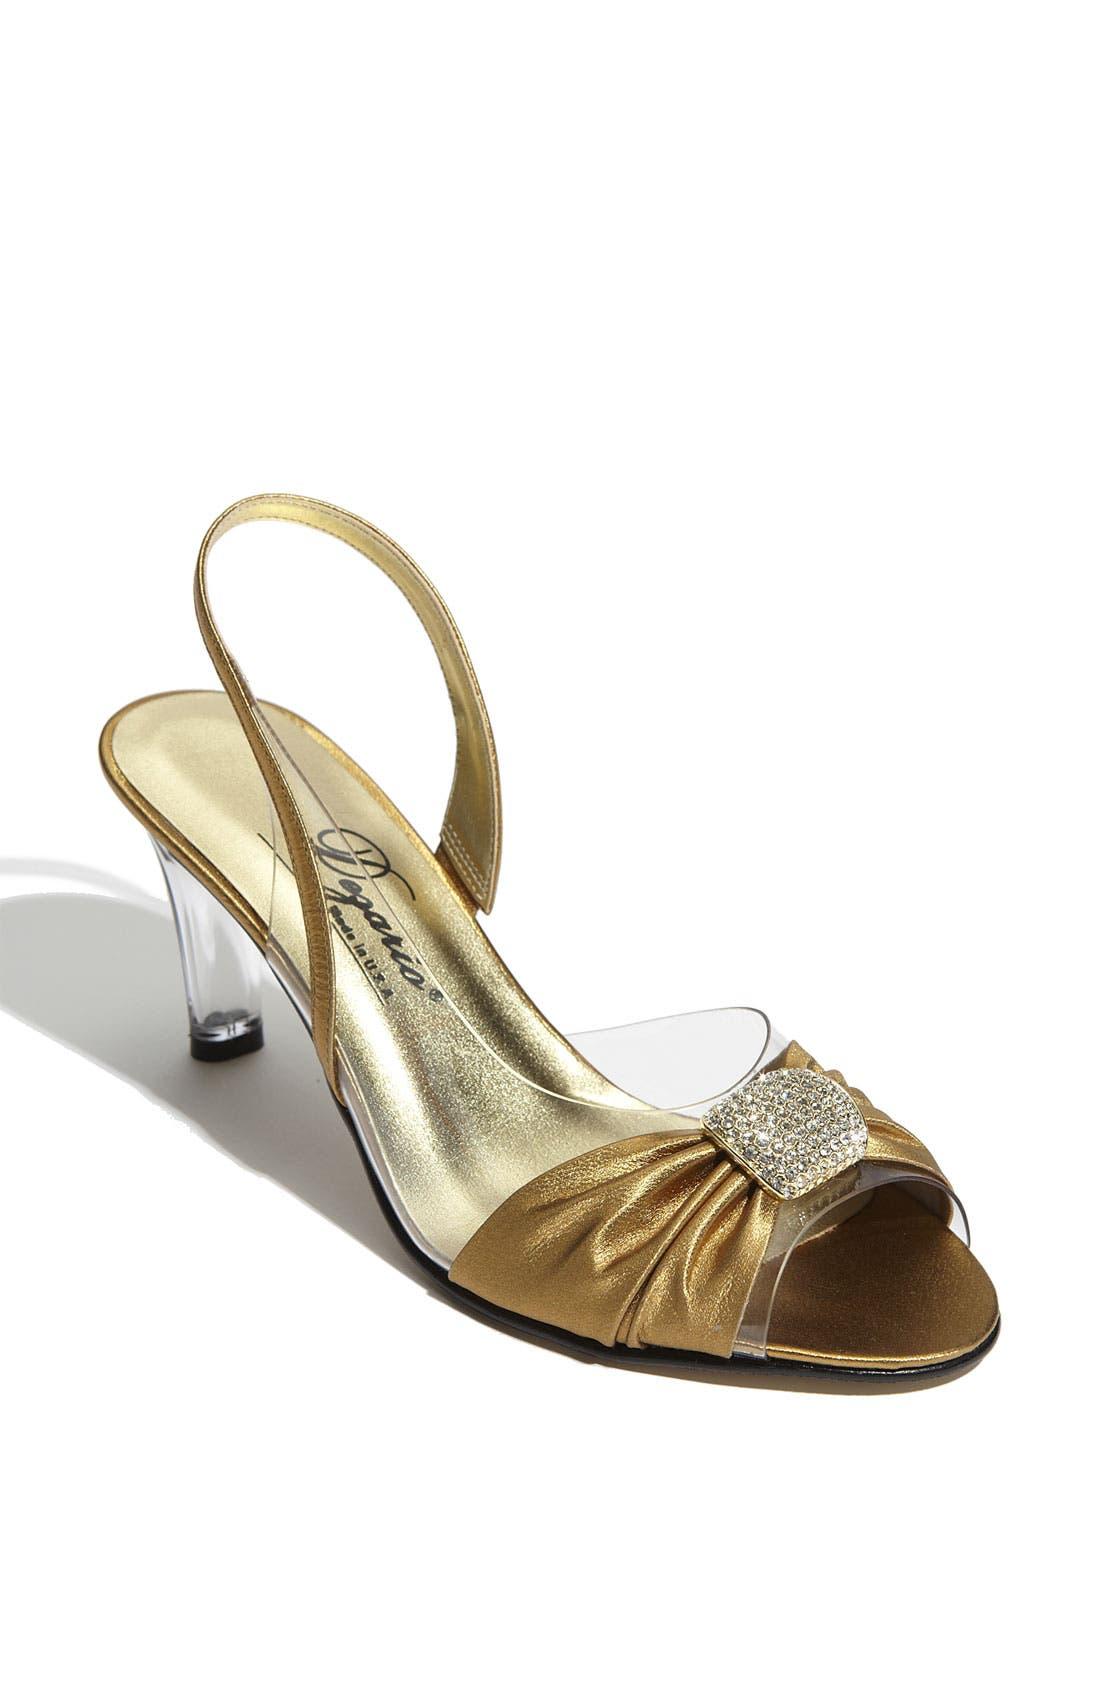 Main Image - Dezario 'Turban' Slingback Sandal